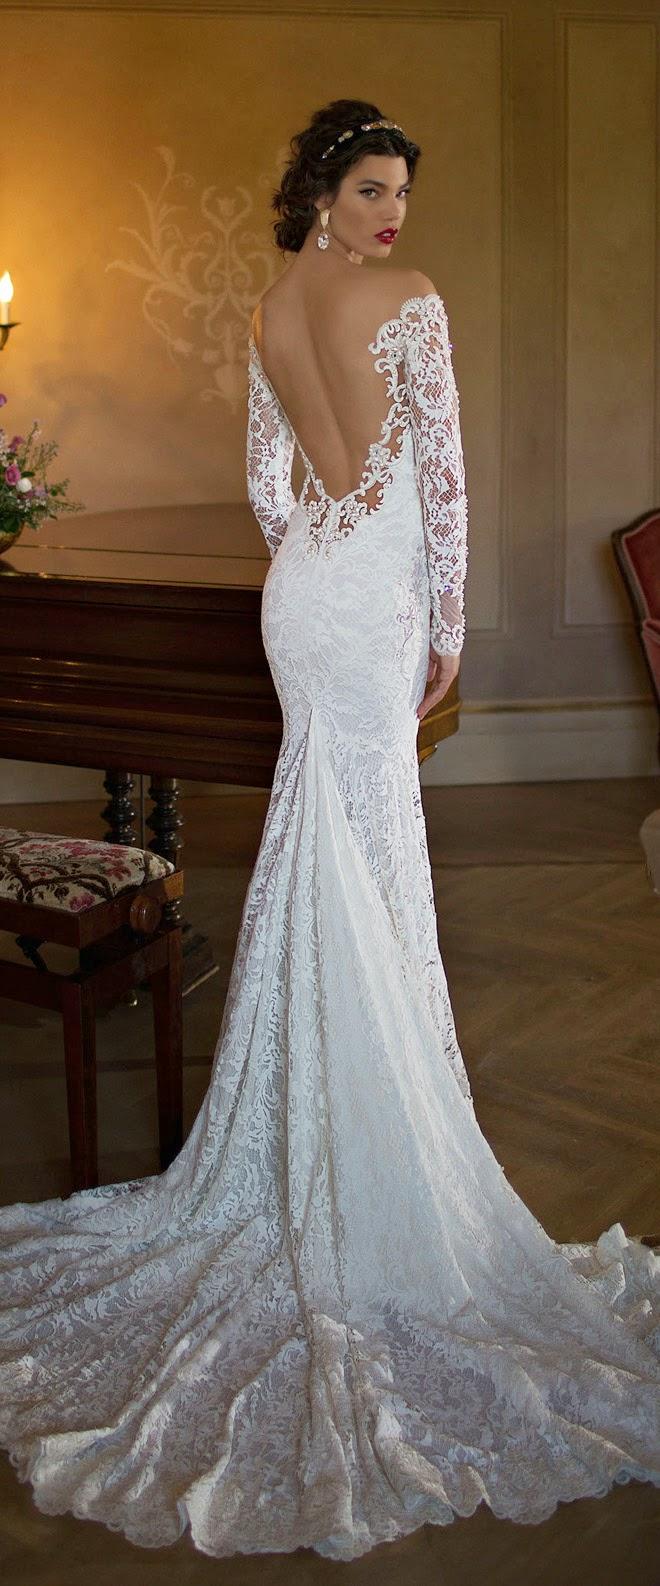 Tea length wedding dress patterns to sew  millicent pobee millicentpobee on Pinterest